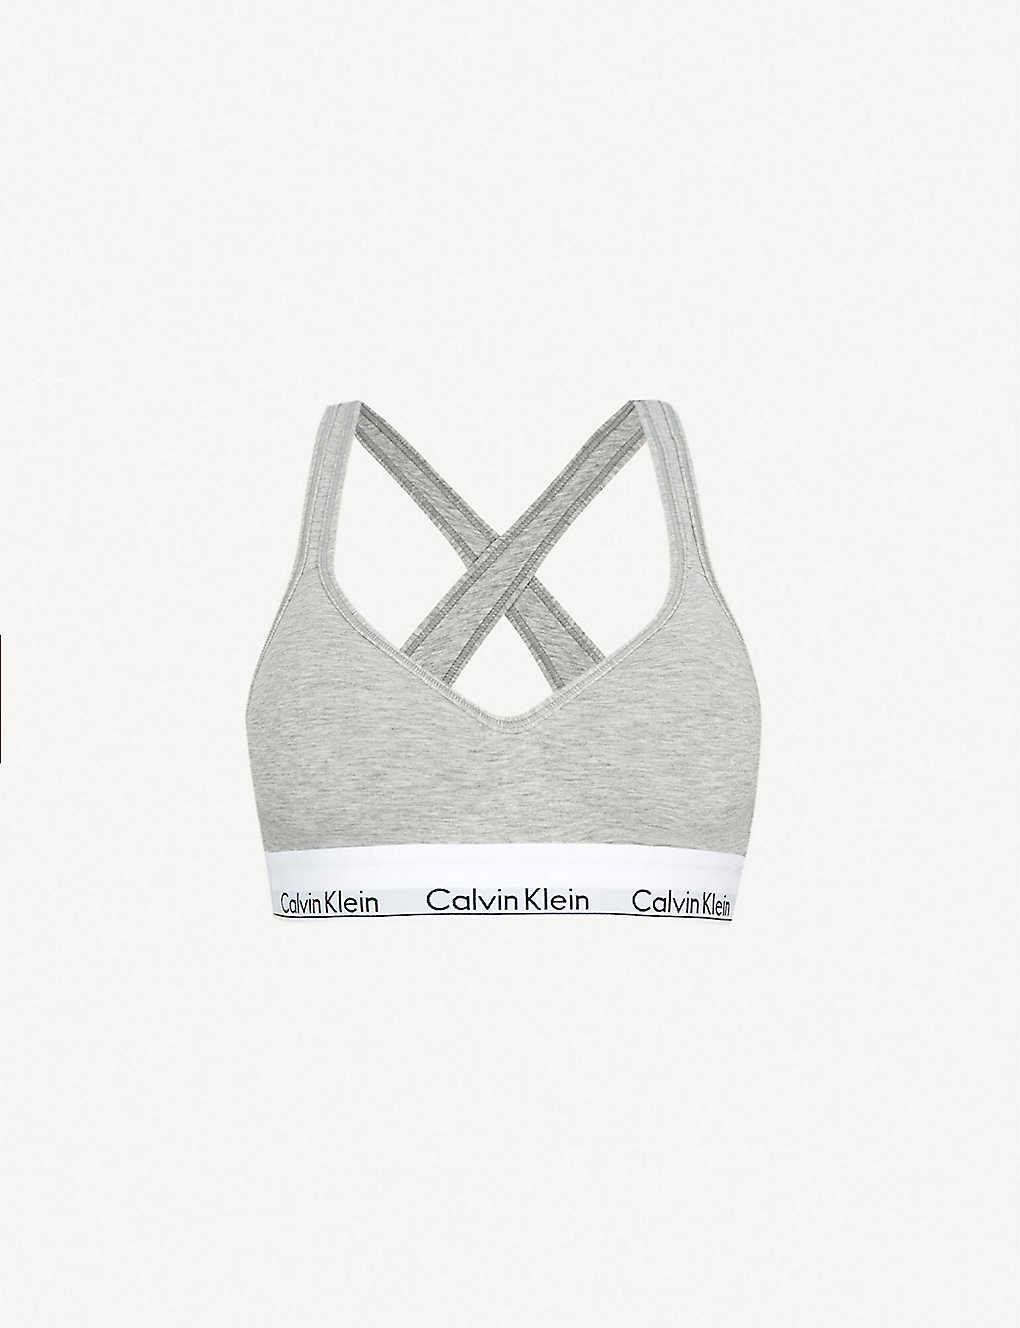 Cotton Jersey Set